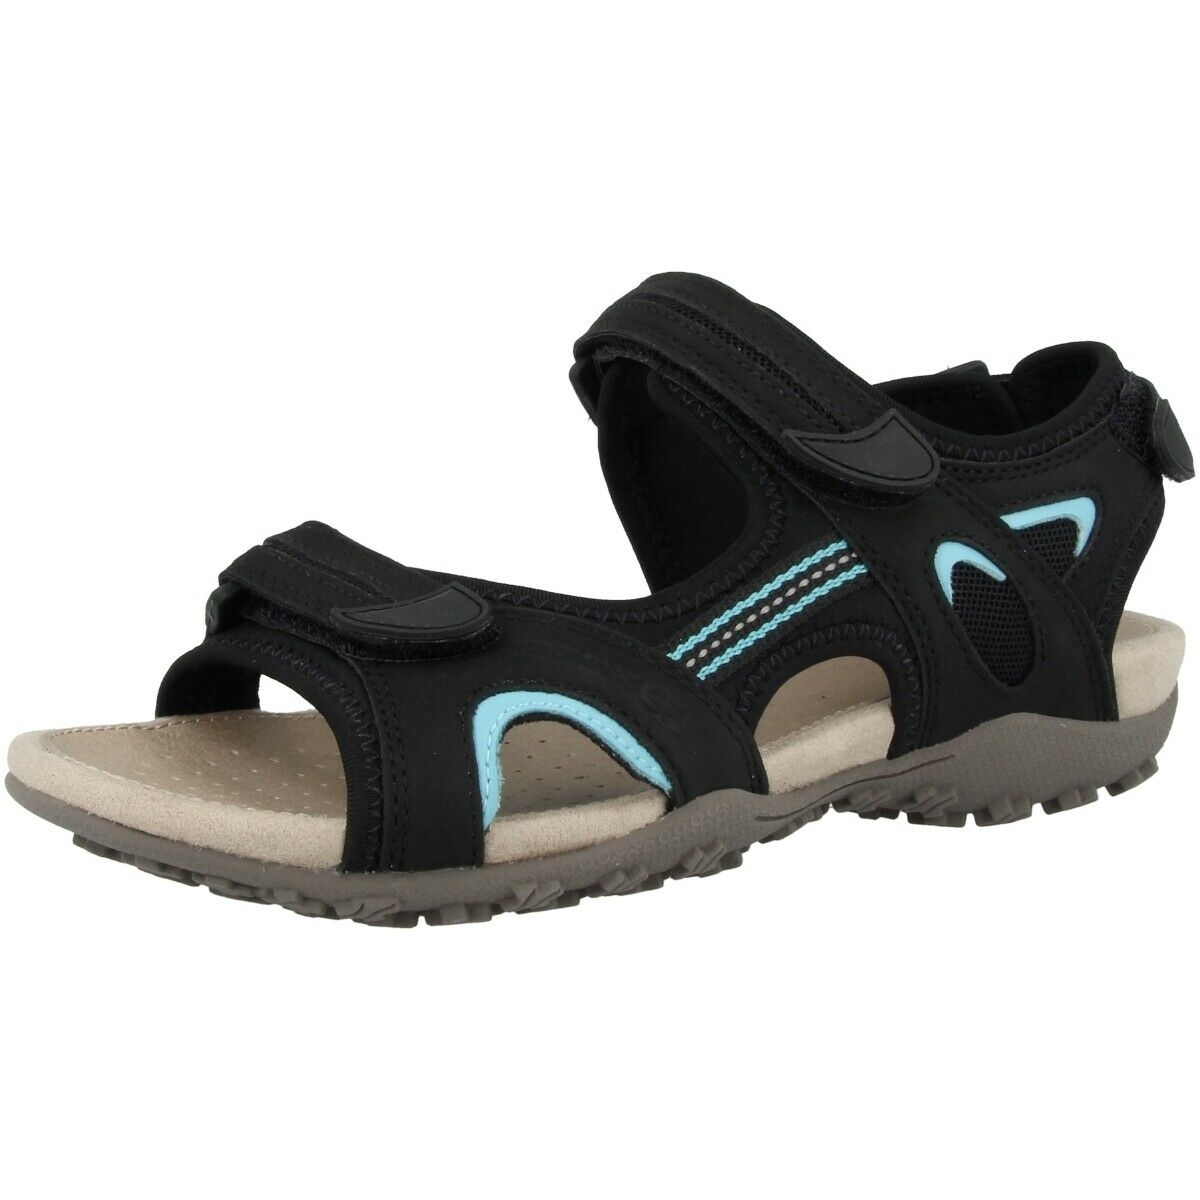 Geox D  SAND. Strel B shoes Womens Sandals Outdoor Sandals D9225B0EK15C9999  hot sports